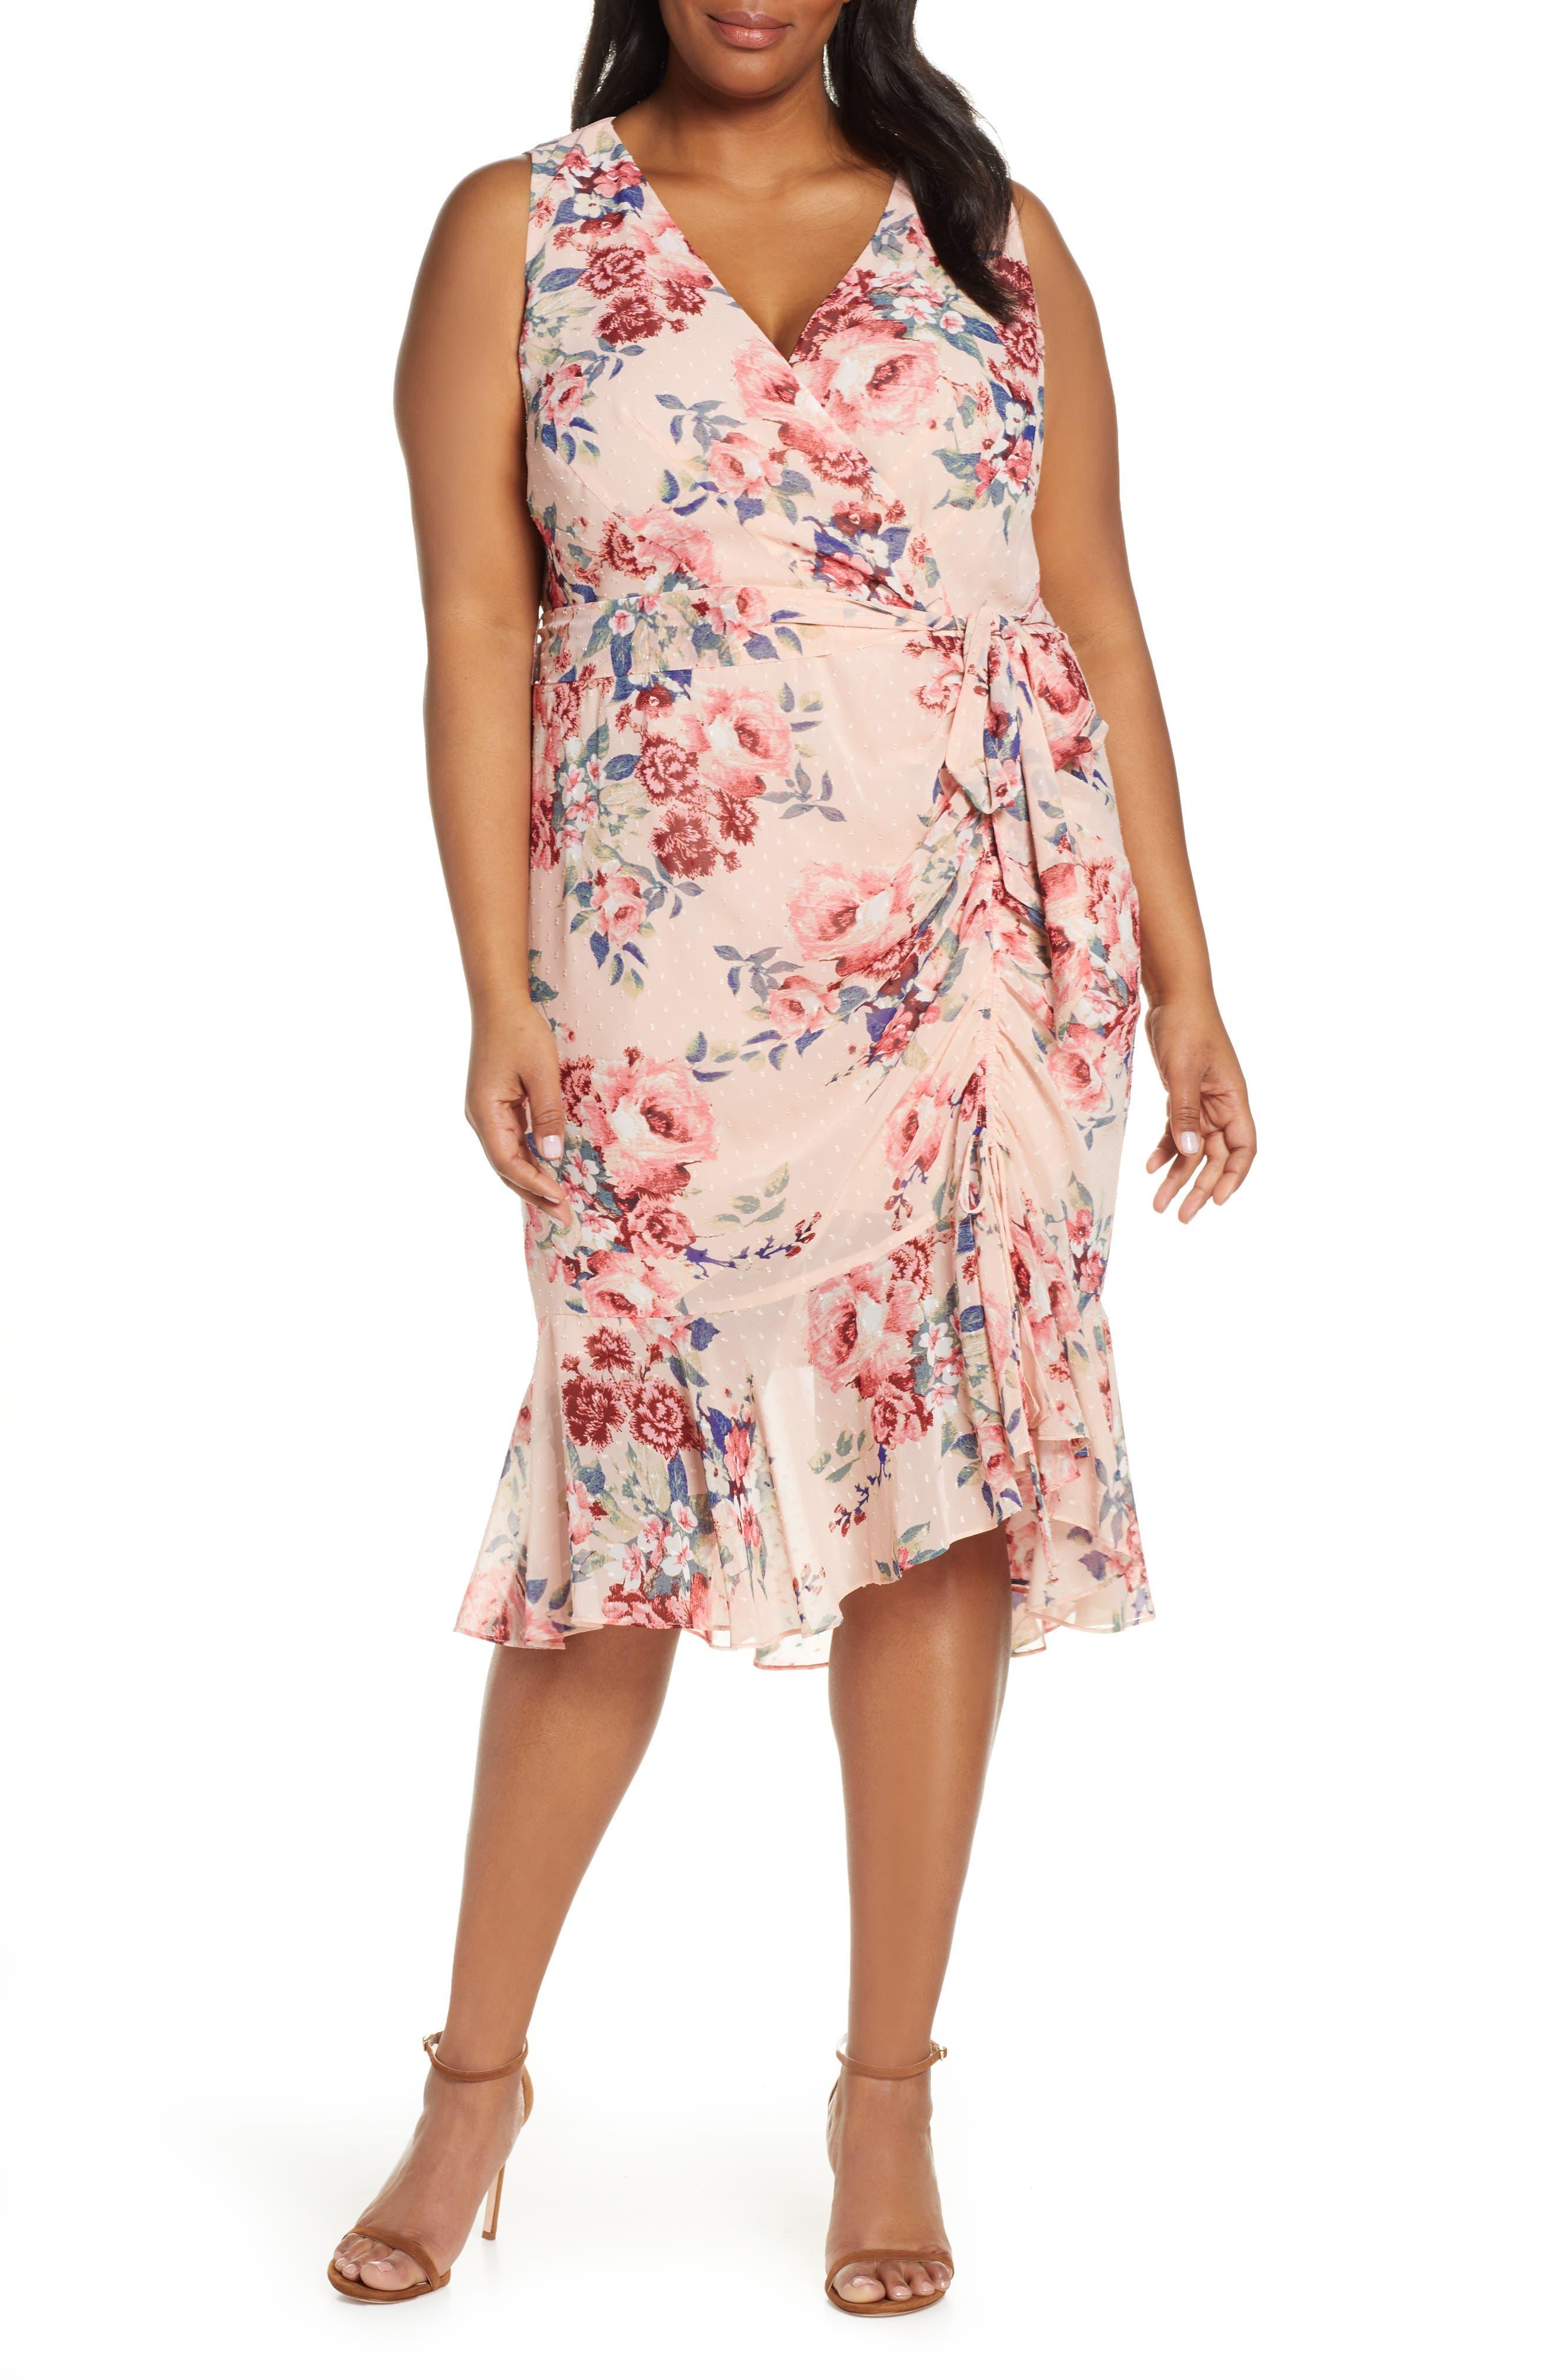 Plus Size Eliza J Floral Sleeveless Chiffon Dress, Pink